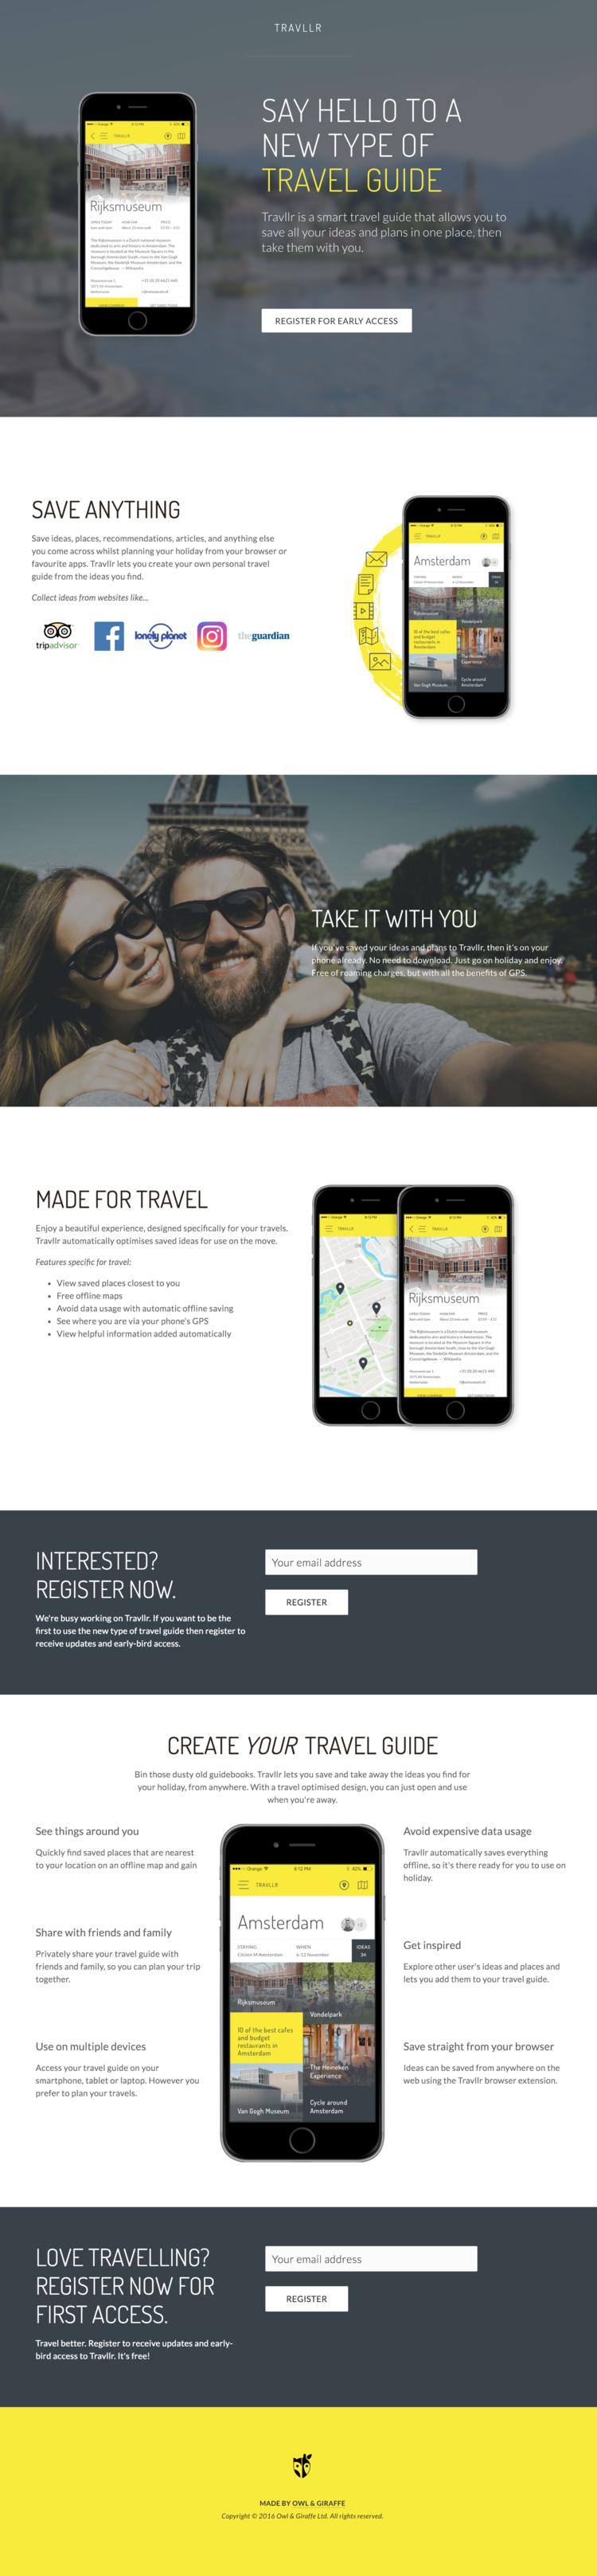 Travllr product landing page